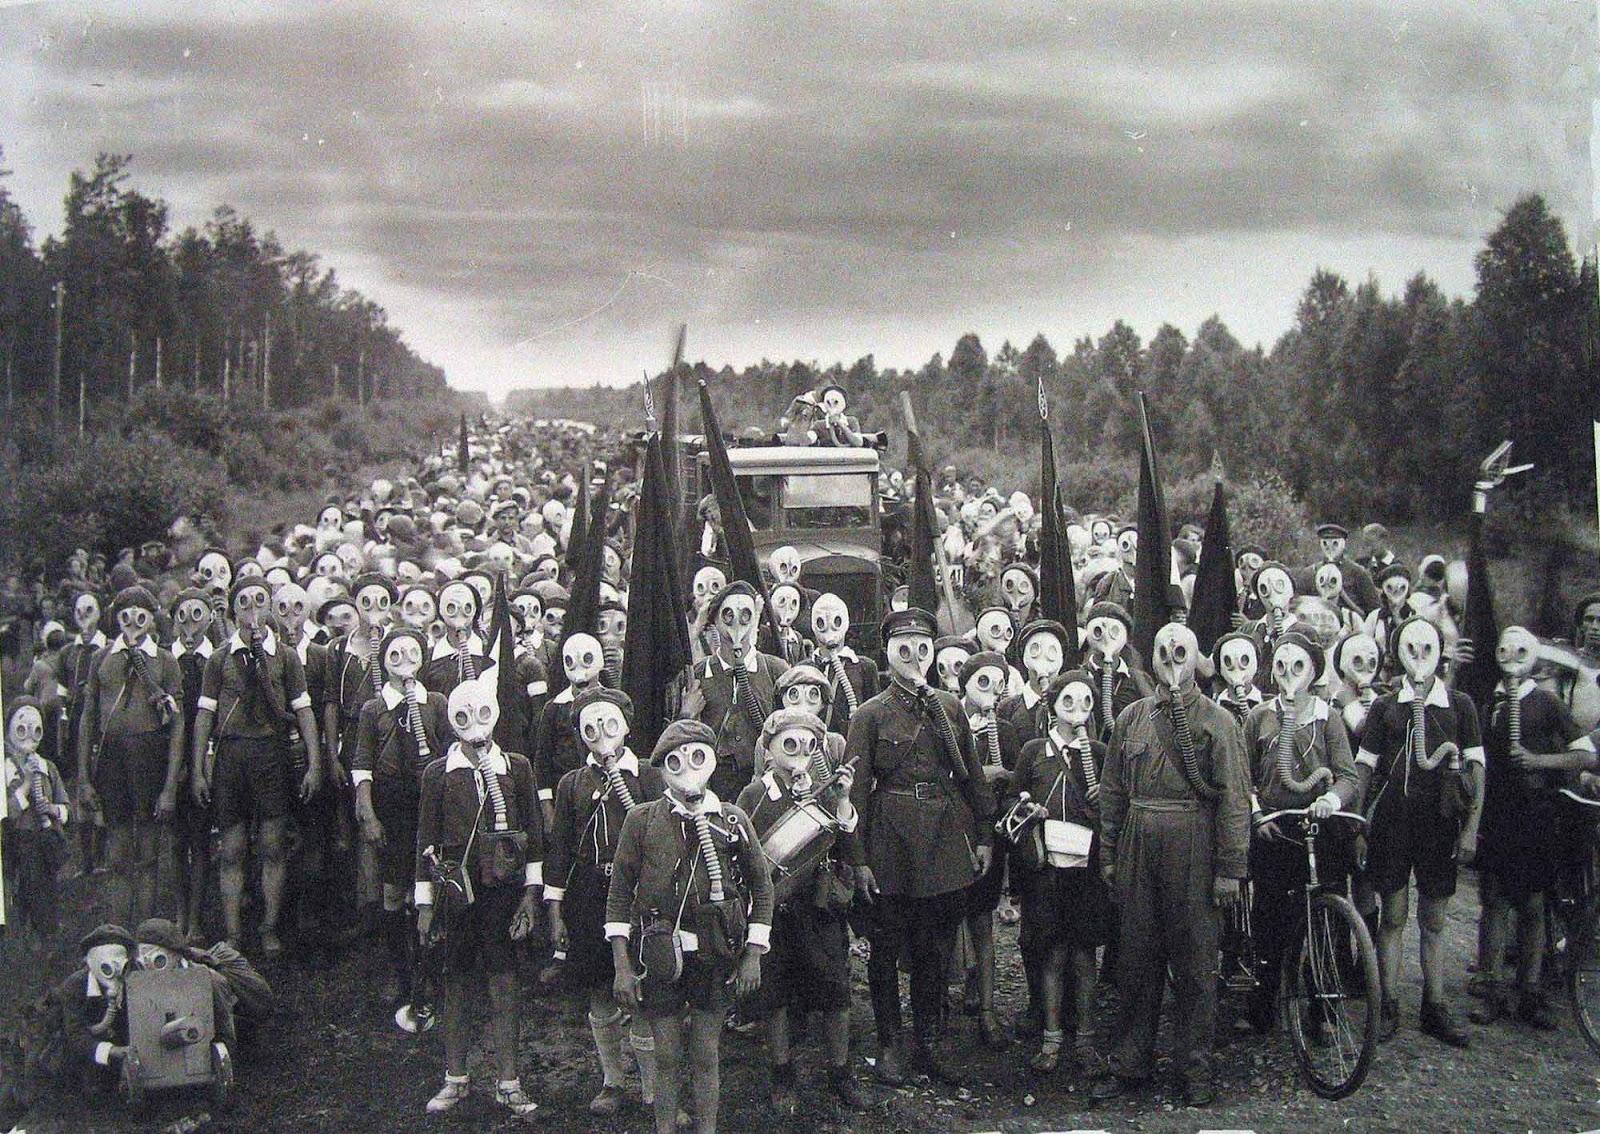 Pioneers of Leningrad in a defense drill, 1937.